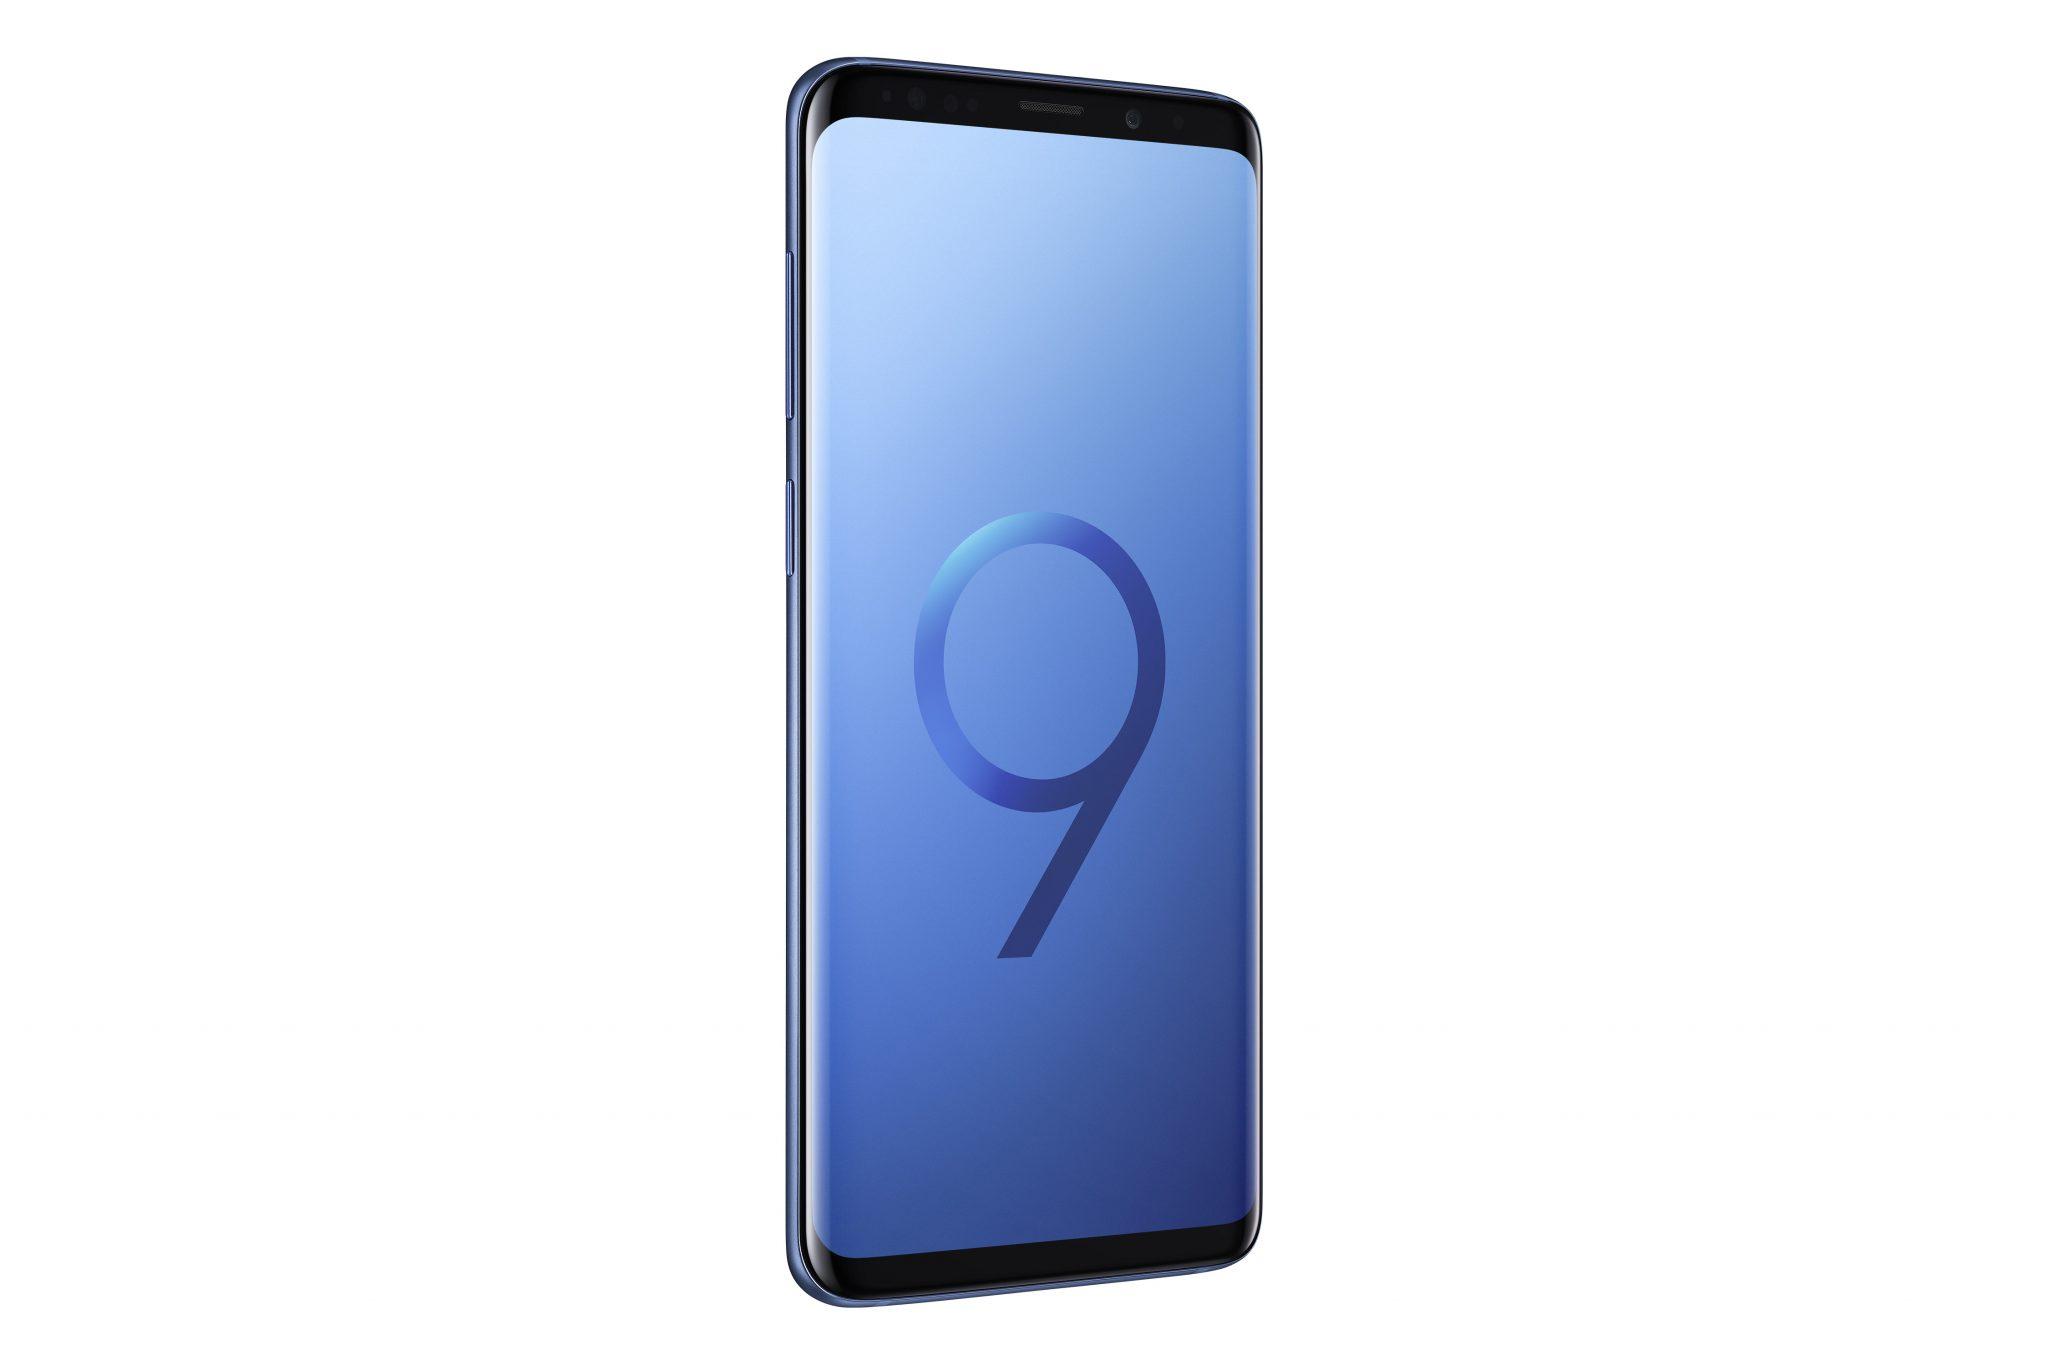 SM G965 GalaxyS9Plus L30 Blue 1 - SM_G965_GalaxyS9Plus_L30_Blue